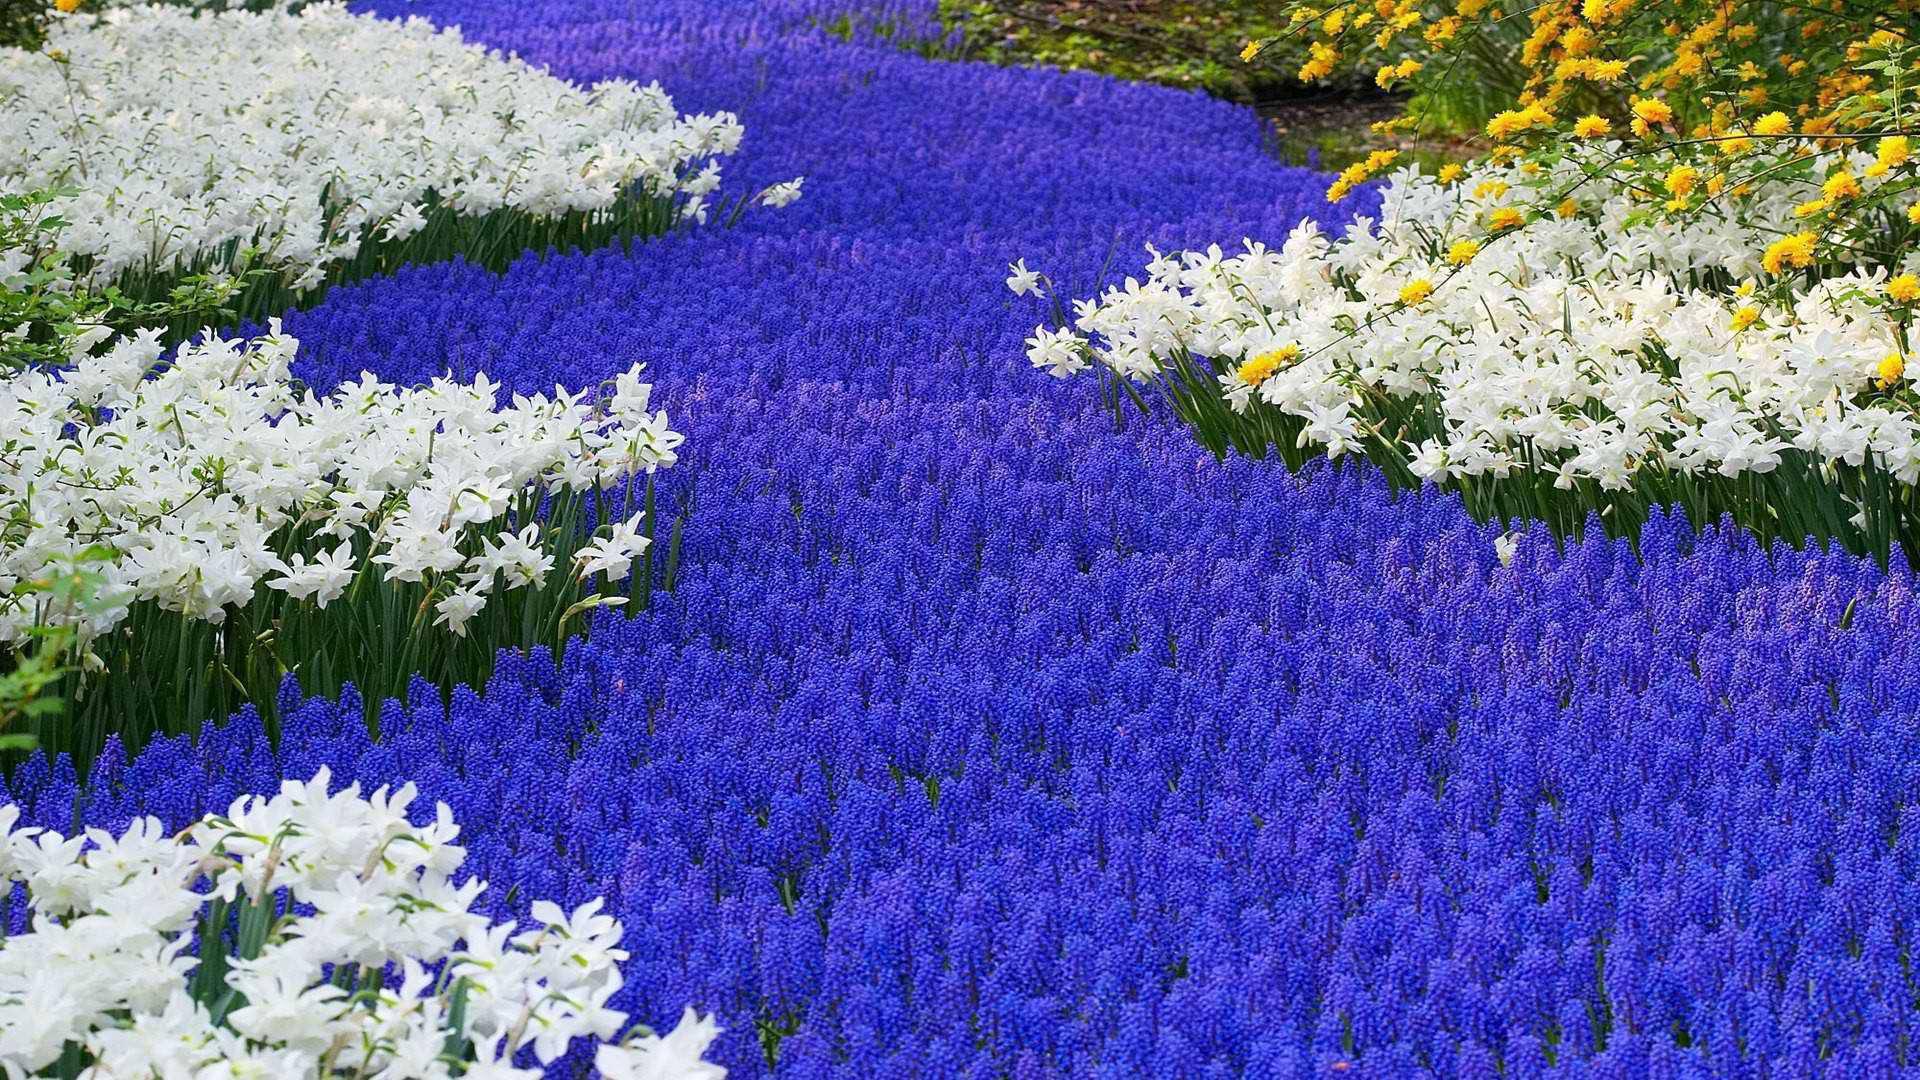 Fondos De Flores Wallpapers Hd Gratis: Fondos De Pantalla Wallpapers Gratis: Flores De Holanda